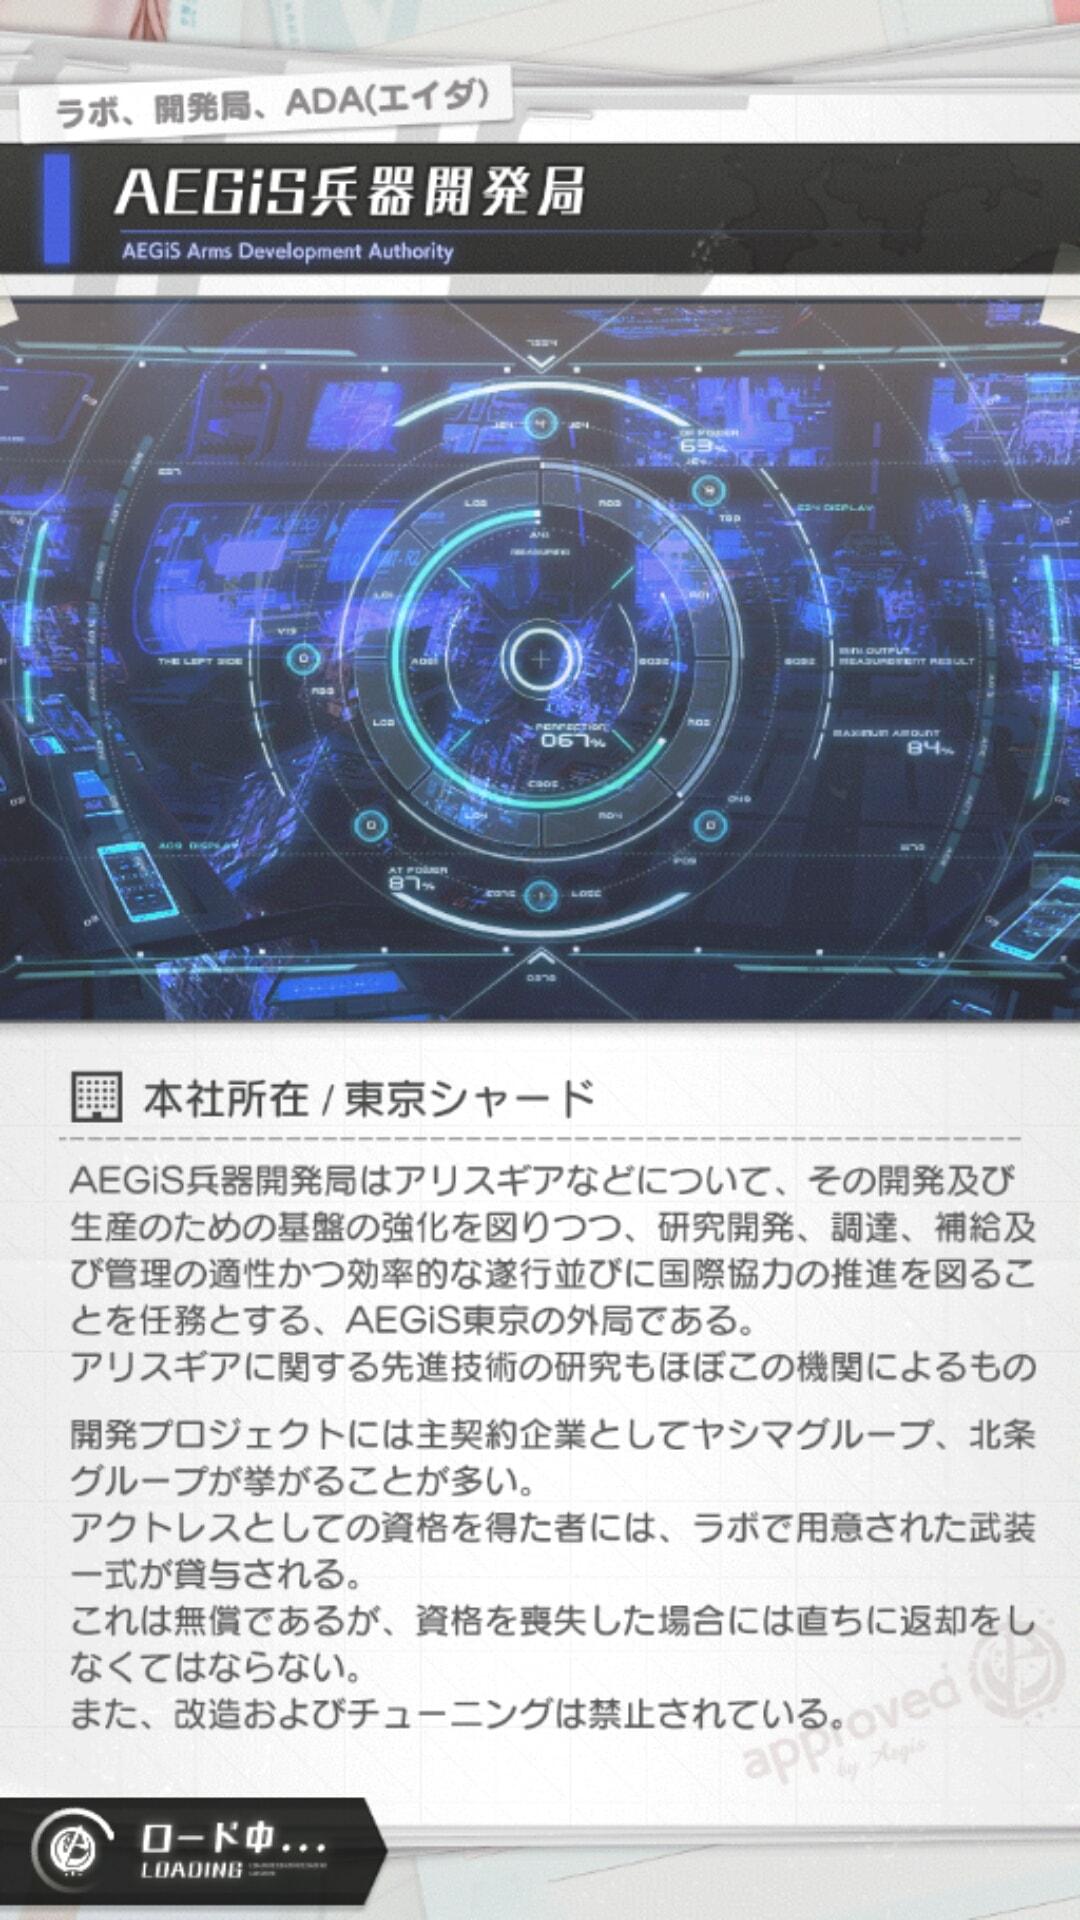 AEGiS兵器開発局.jpg